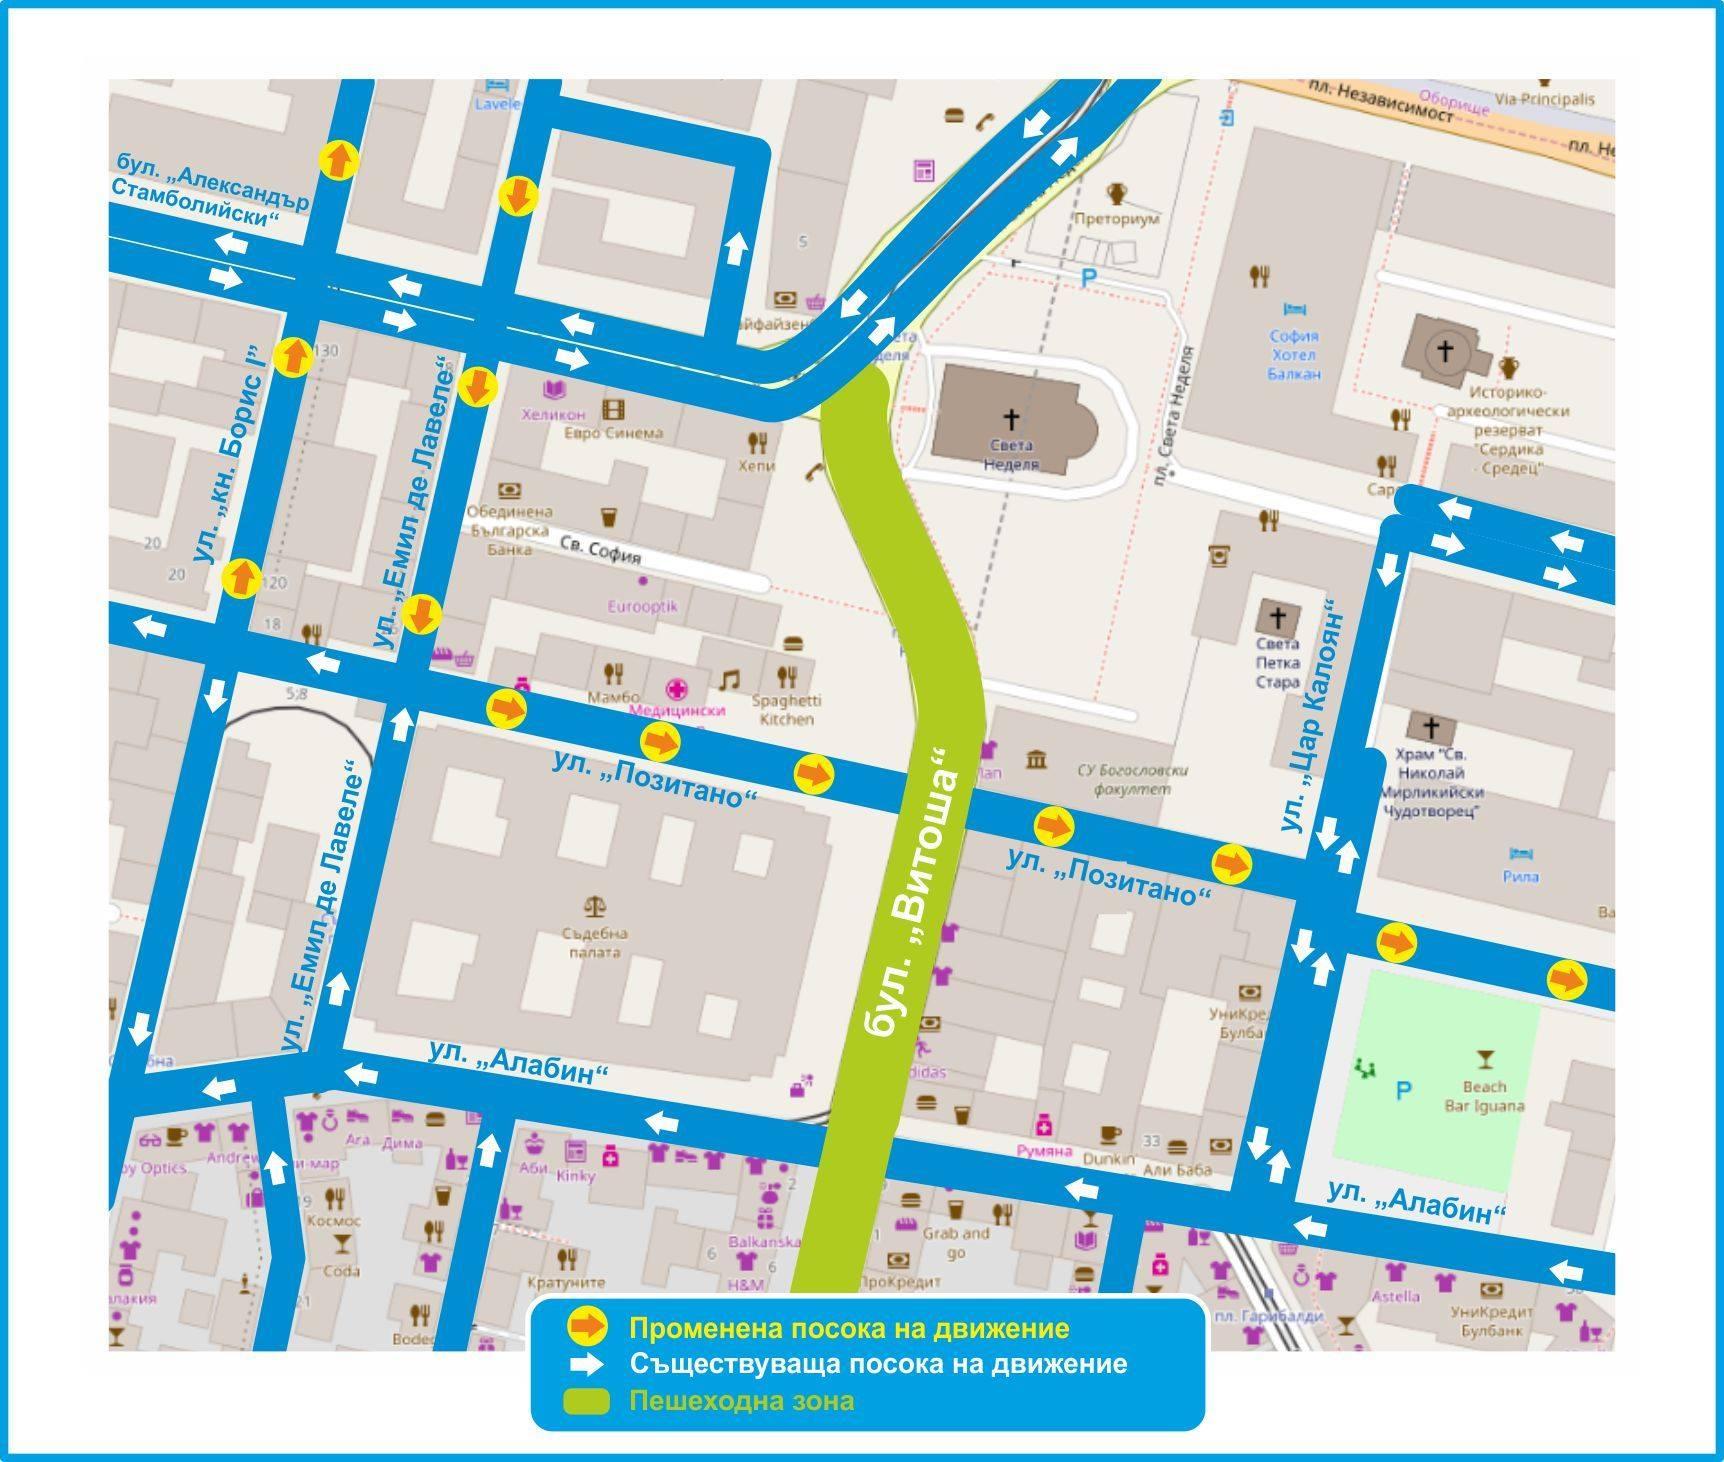 pedestrian-zone-vitosha-boulevard-sofia